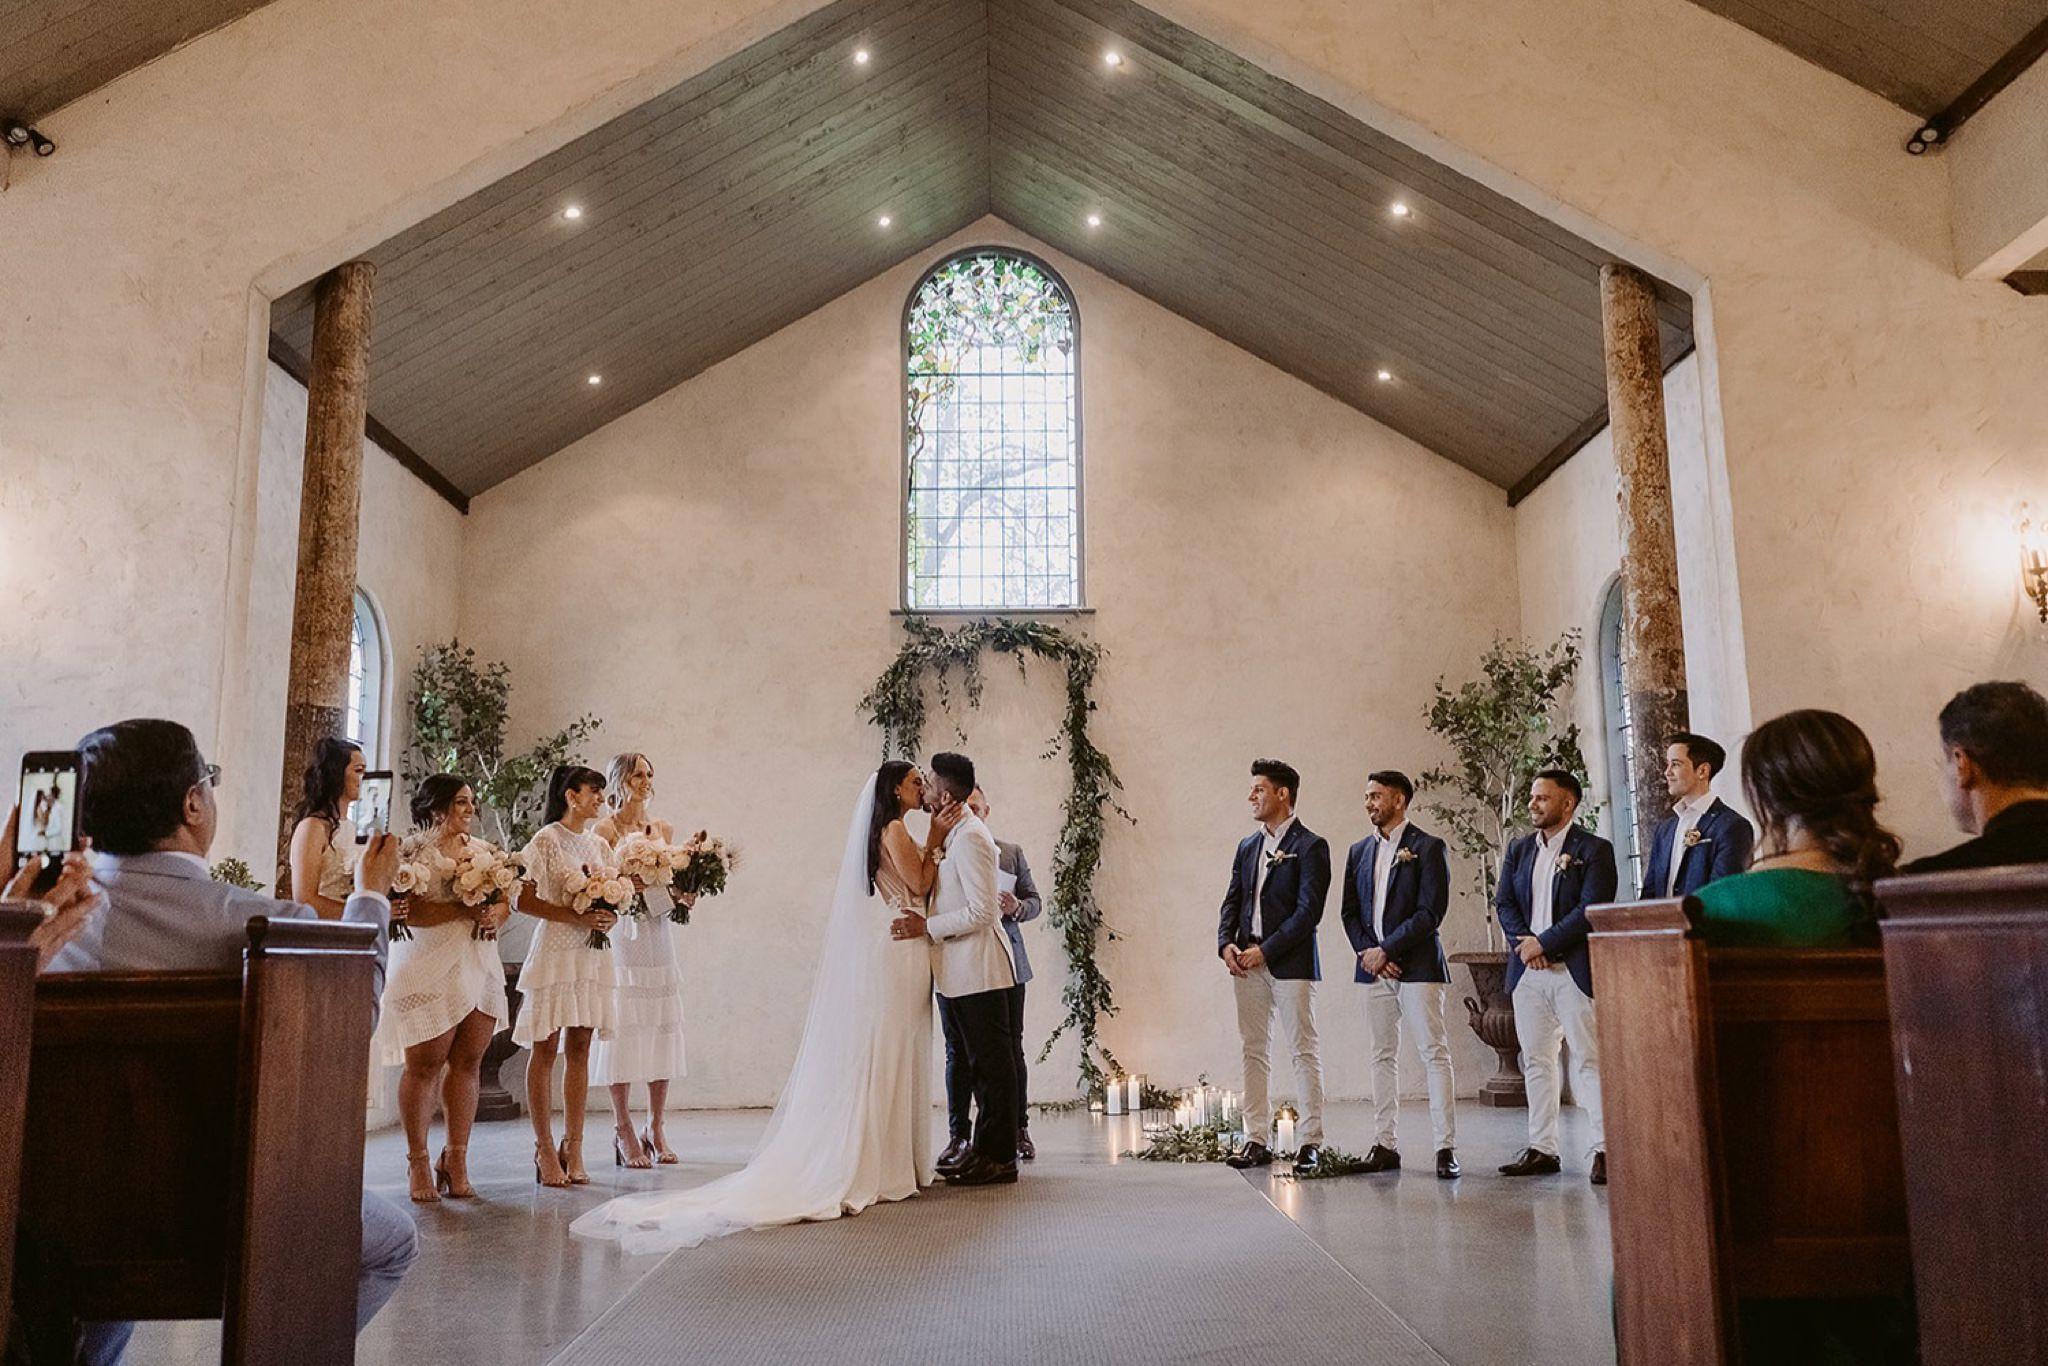 Stones of the Yarra Valley wedding photographer Ashleigh haase78.jpg